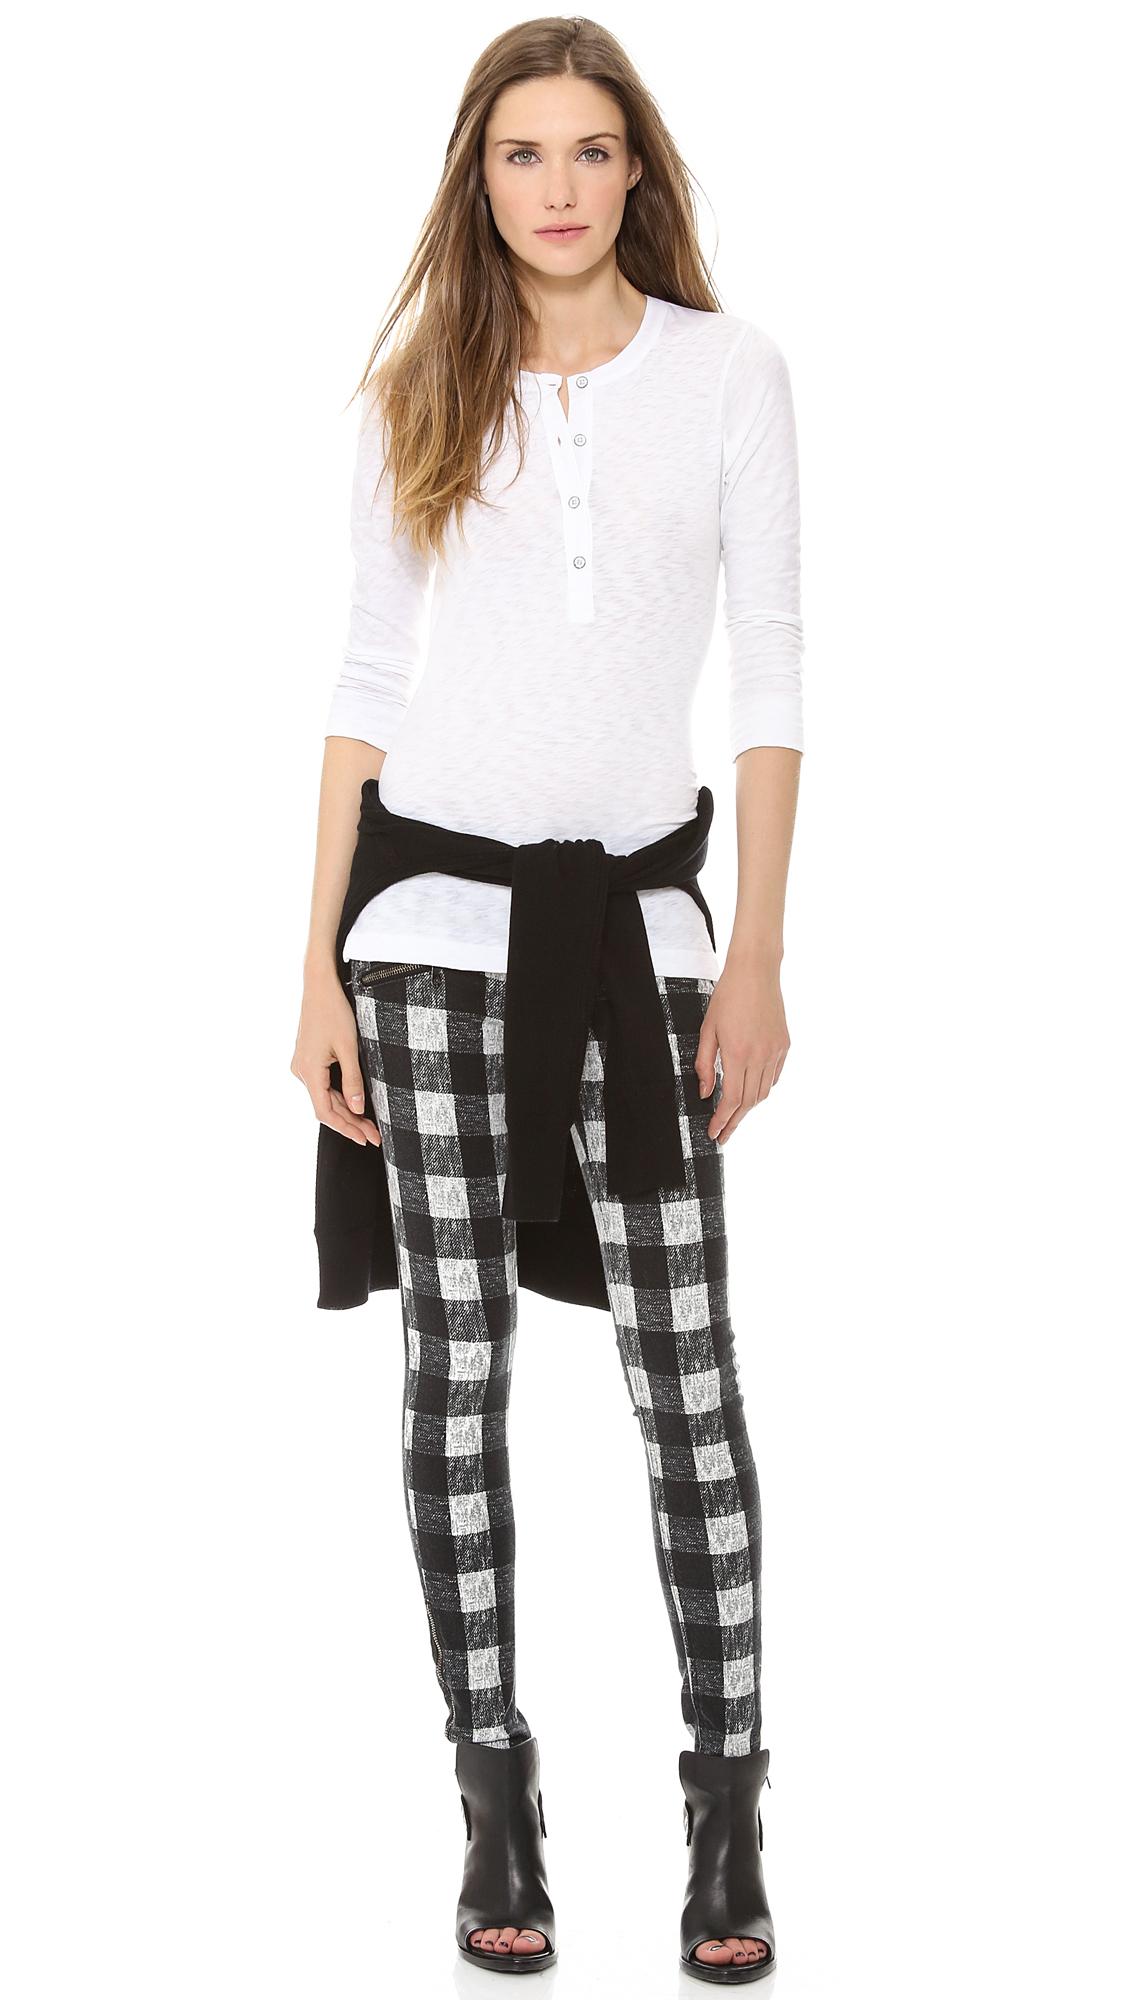 Rag & bone/jean rbw 23 zipper jeans